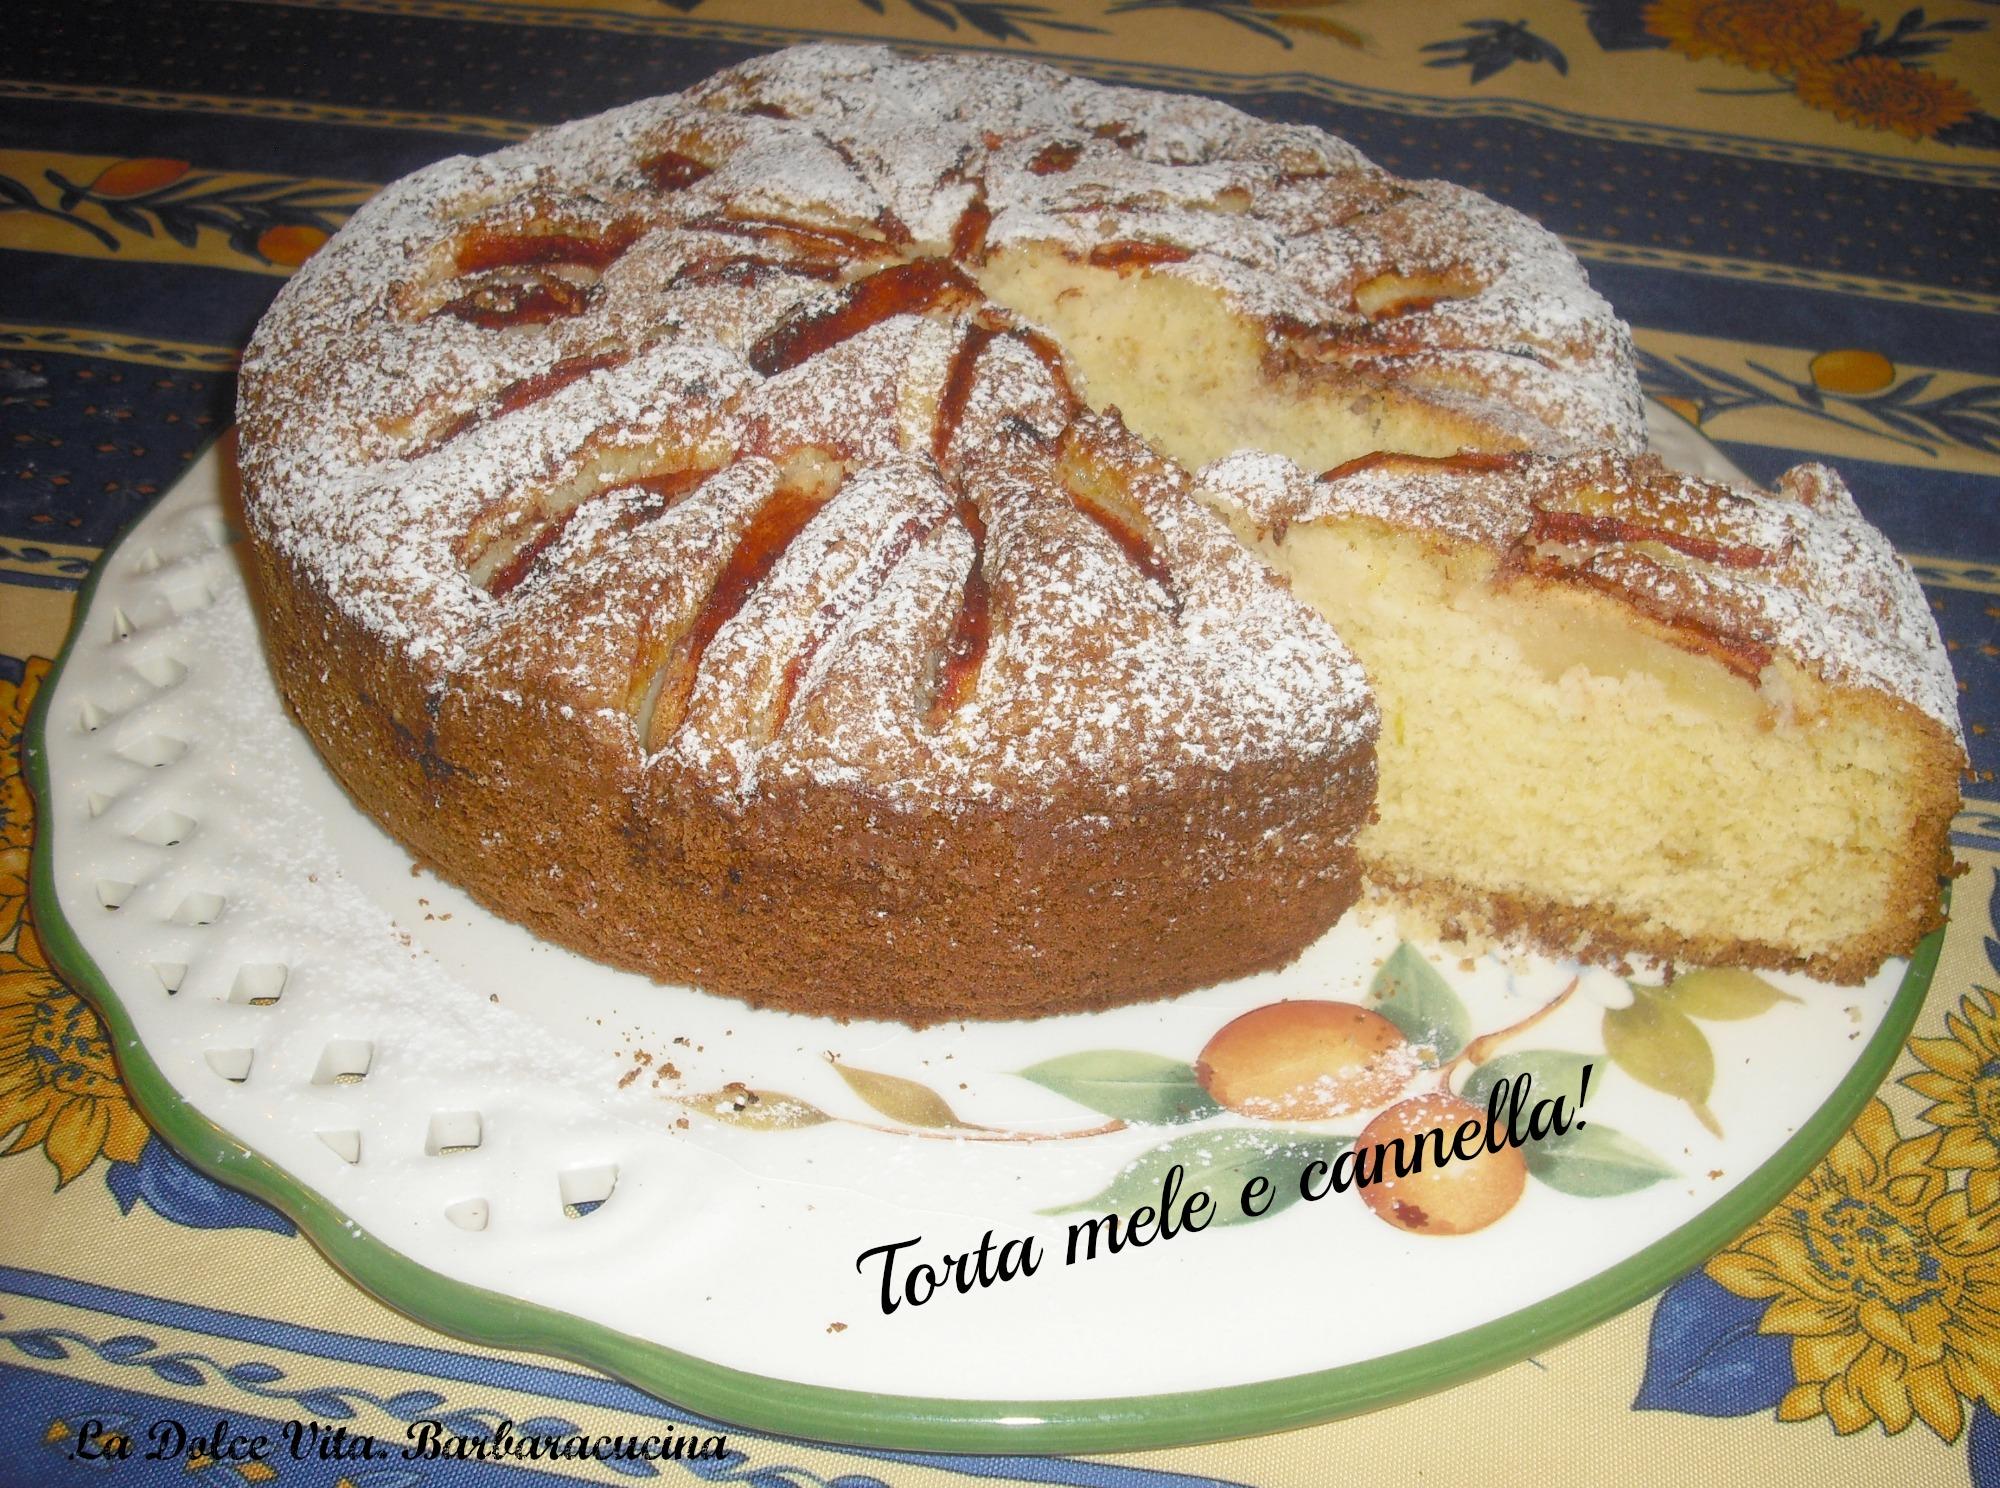 Torta mele e cannella soffice!